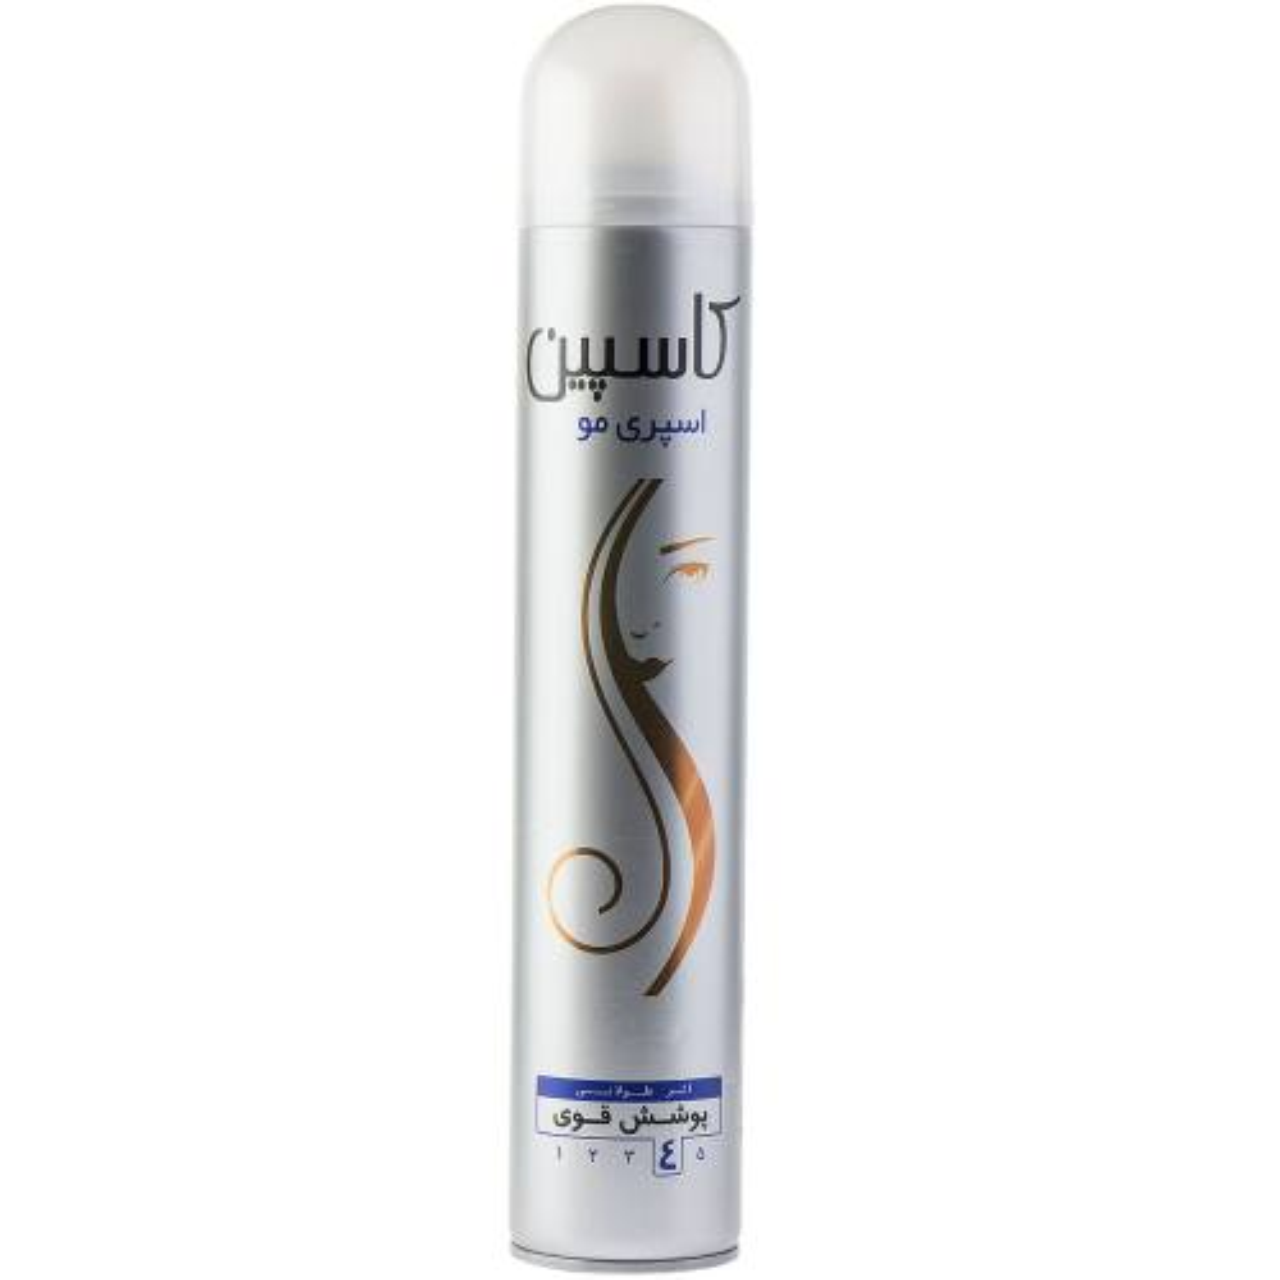 اسپری حالت دهنده مو Caspian مدل Hair Spray حجم 500 میلی لیتر